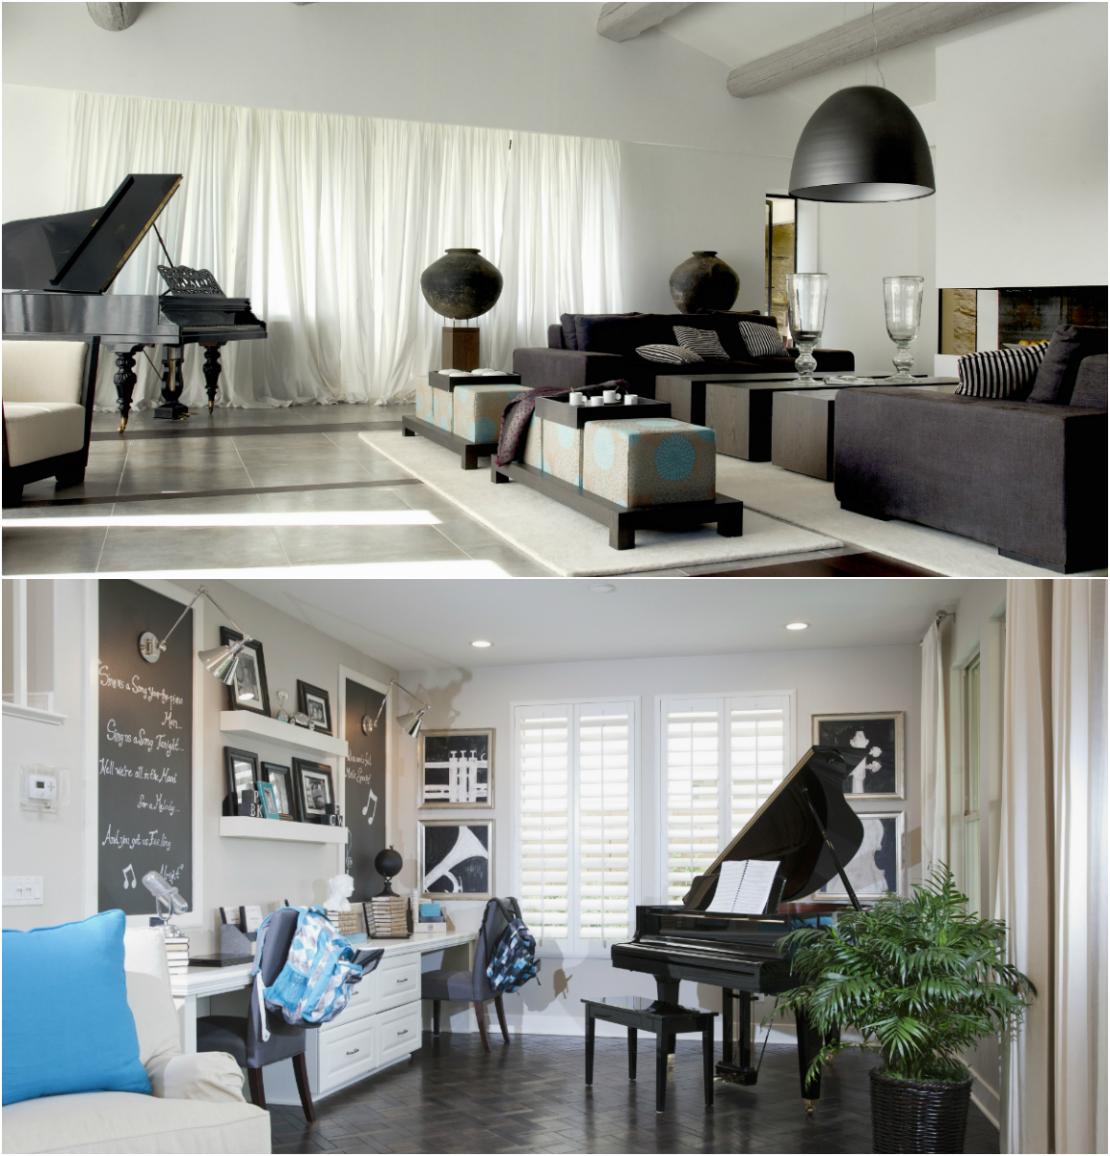 westwing-nietypowe-wnetrze-fortepian-collage